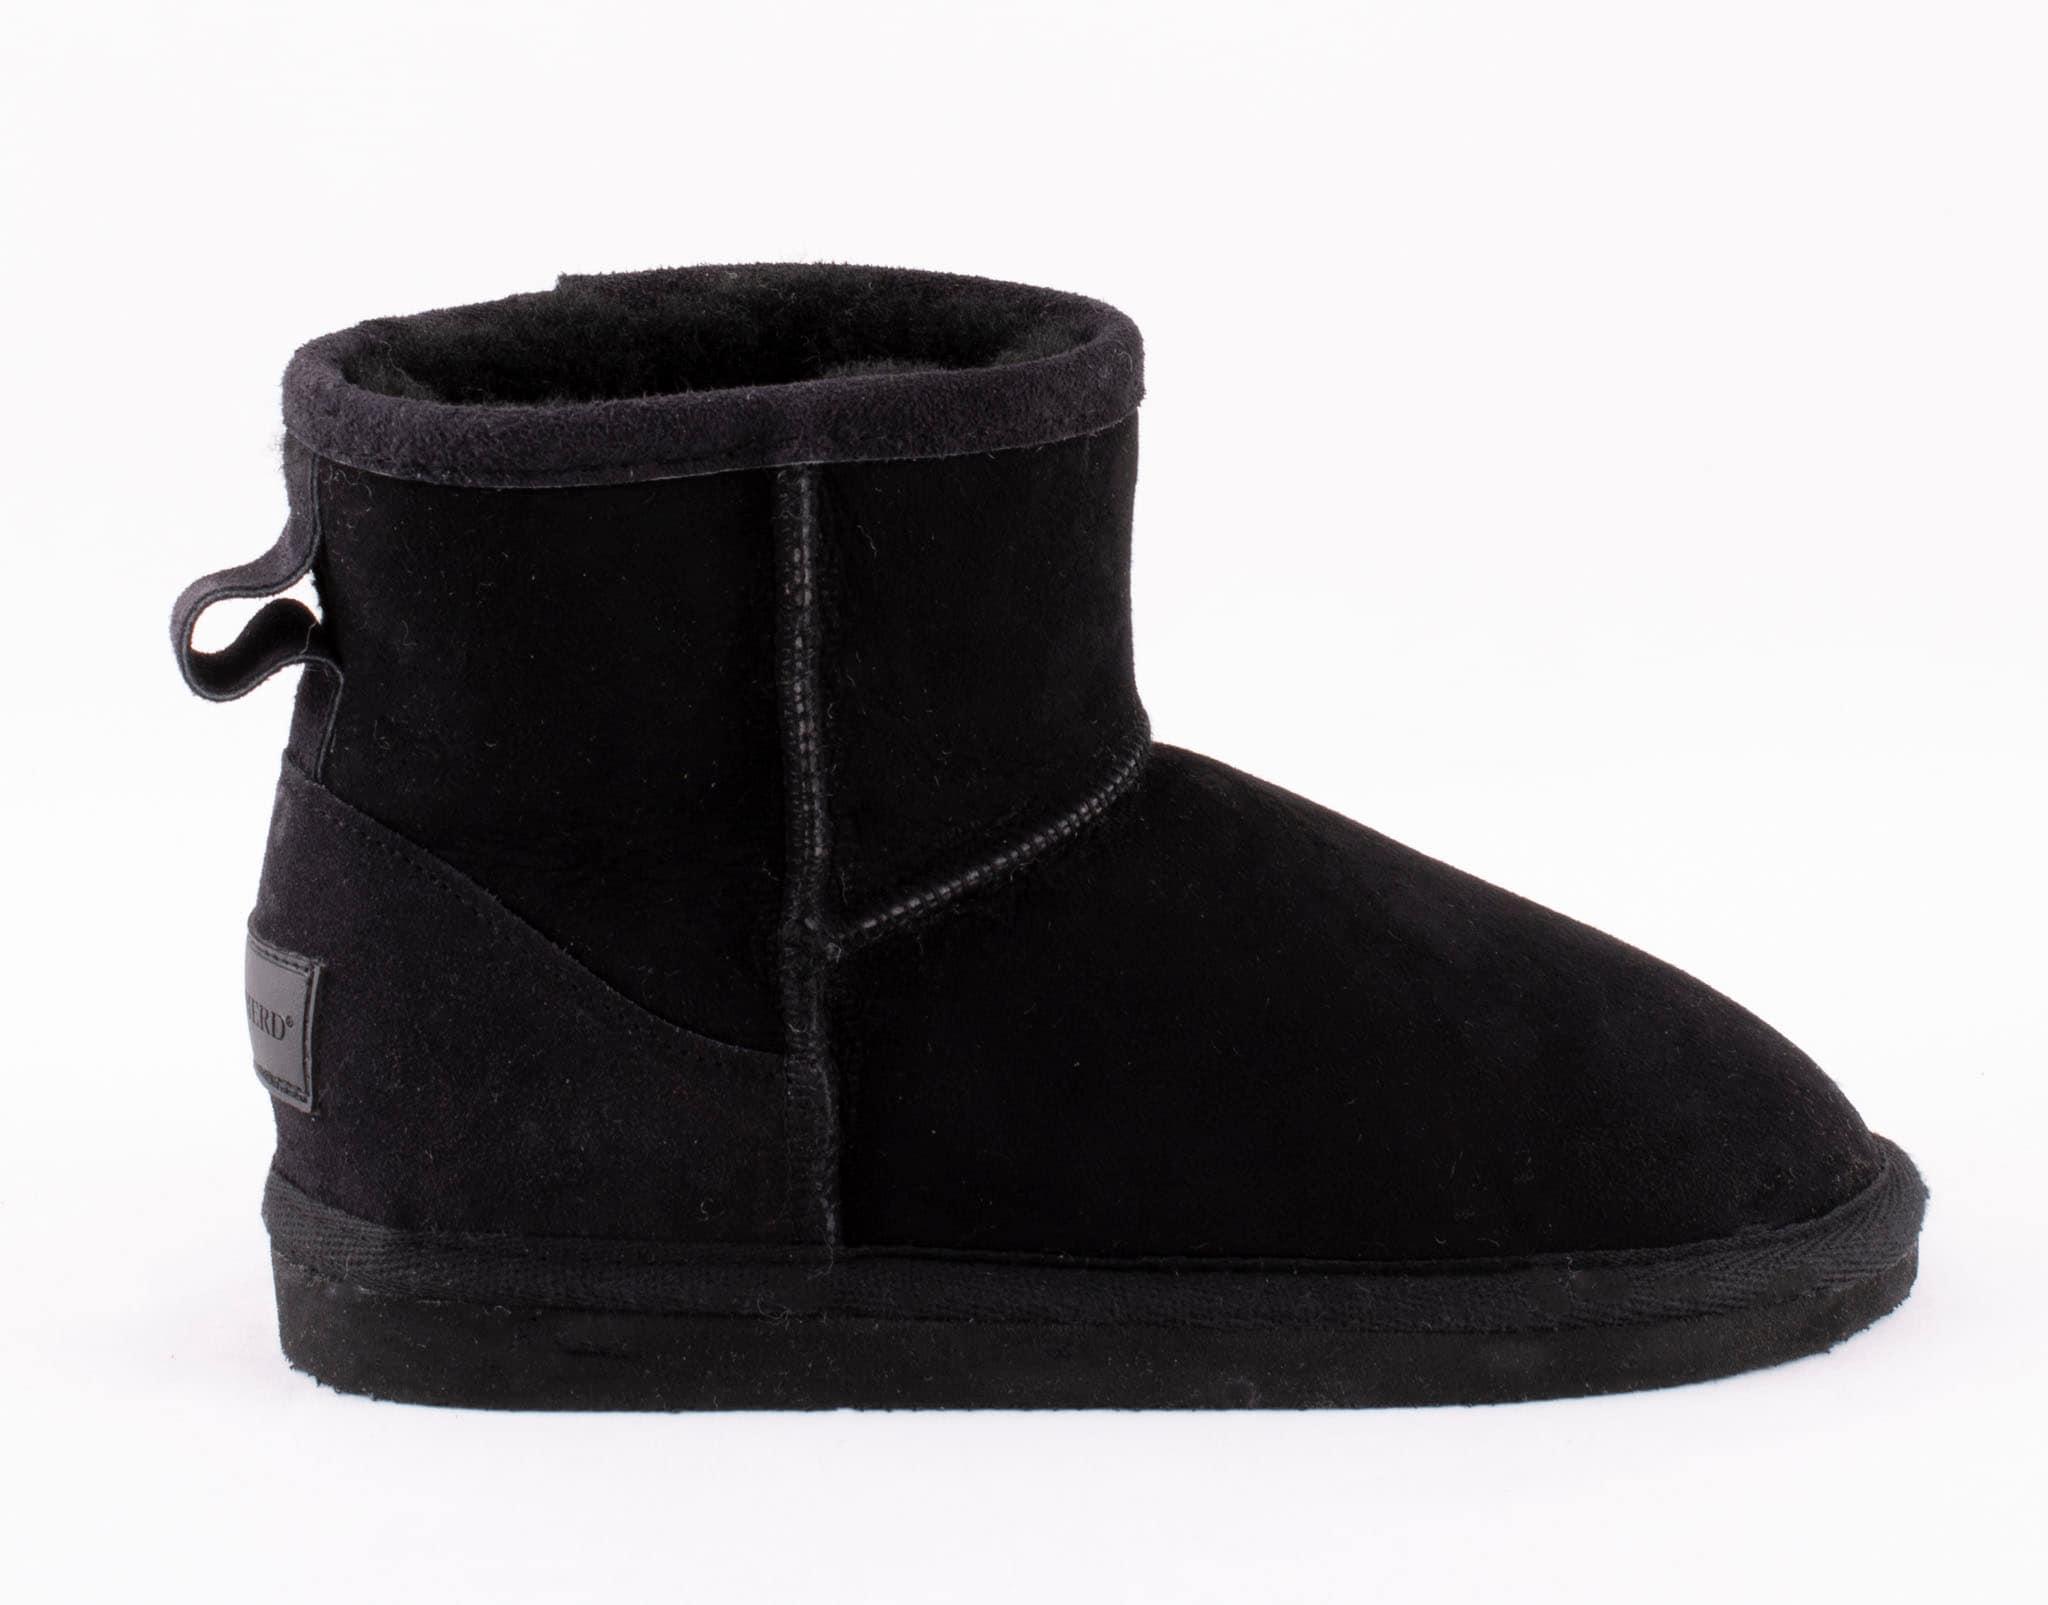 Mora suede boots